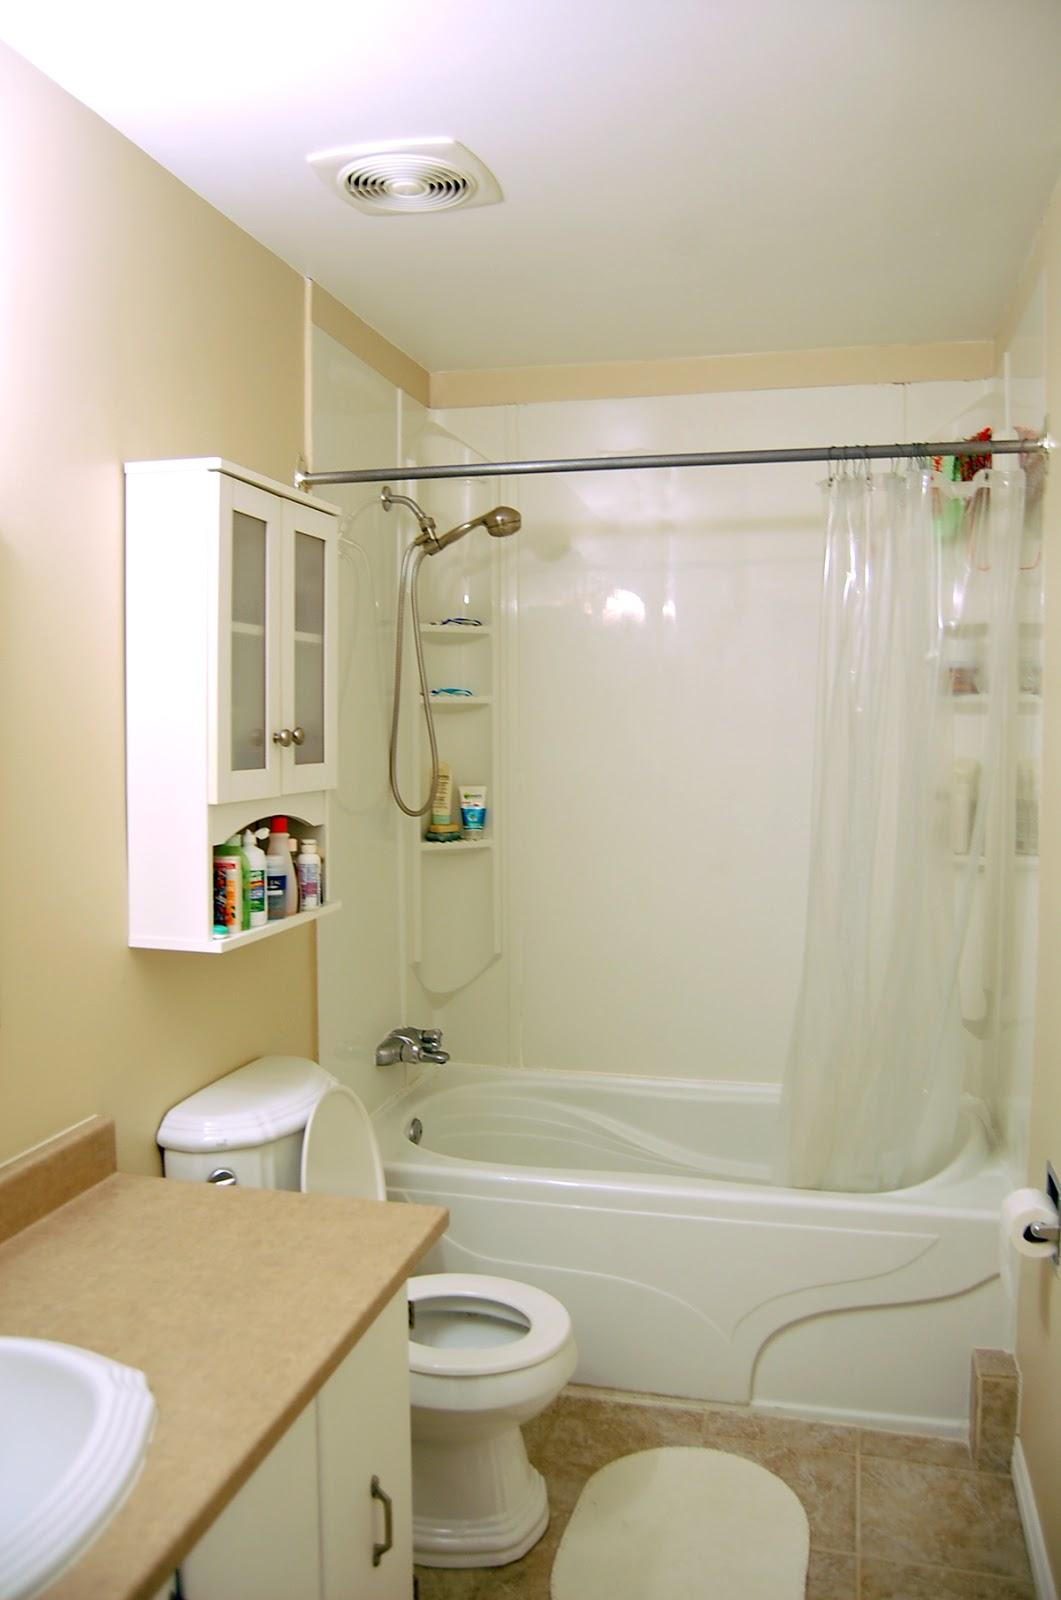 Guest Post: Ksenia of Balanced Ways: DIY bathroom renovation under ...